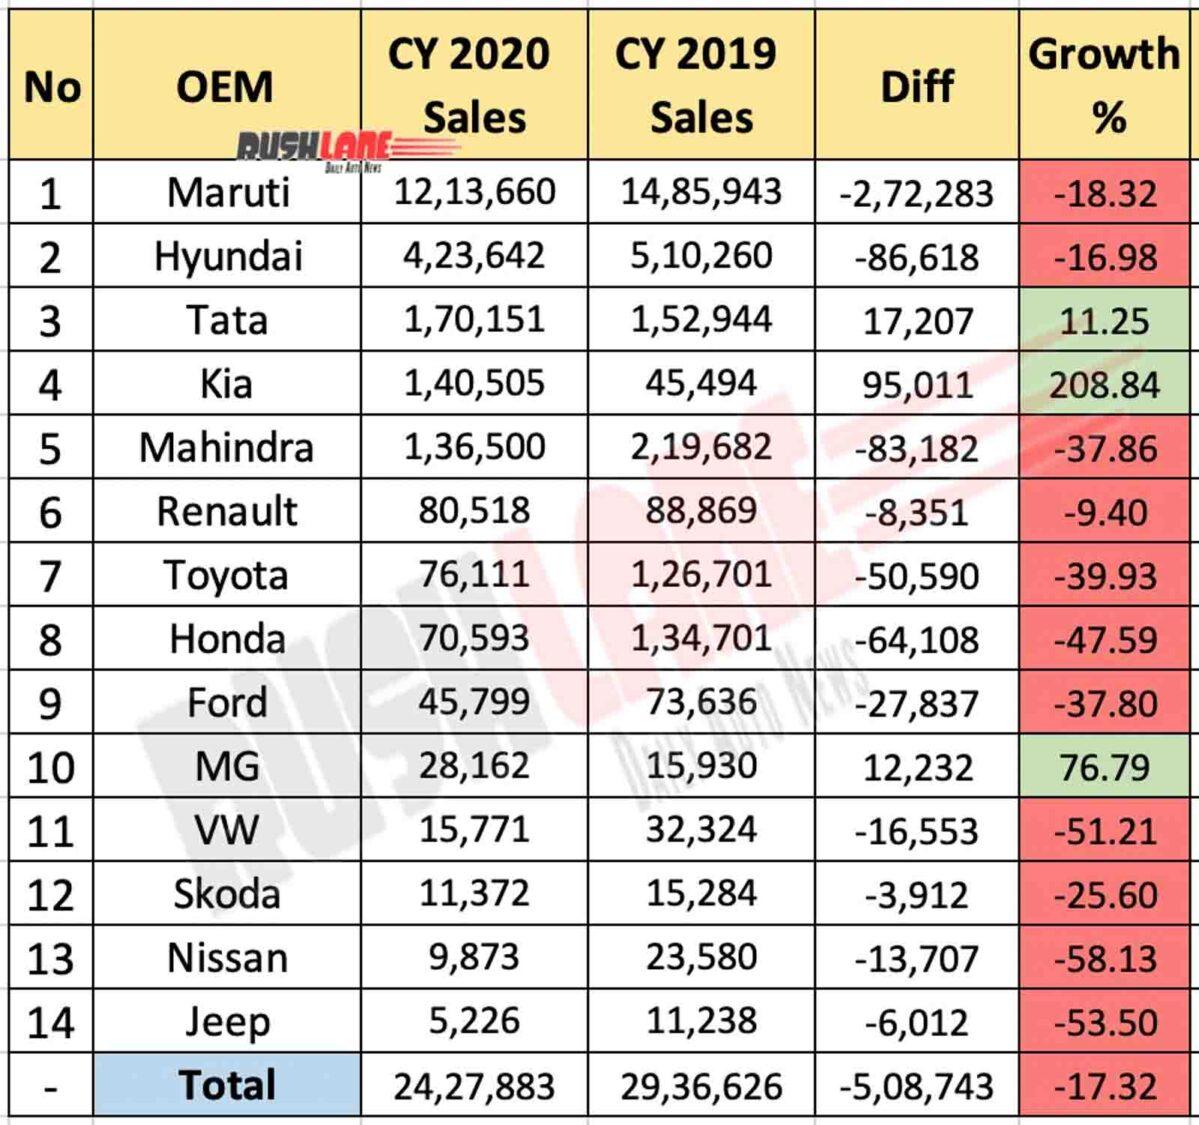 Car Sales For Calendar Year 2020 vs 2019